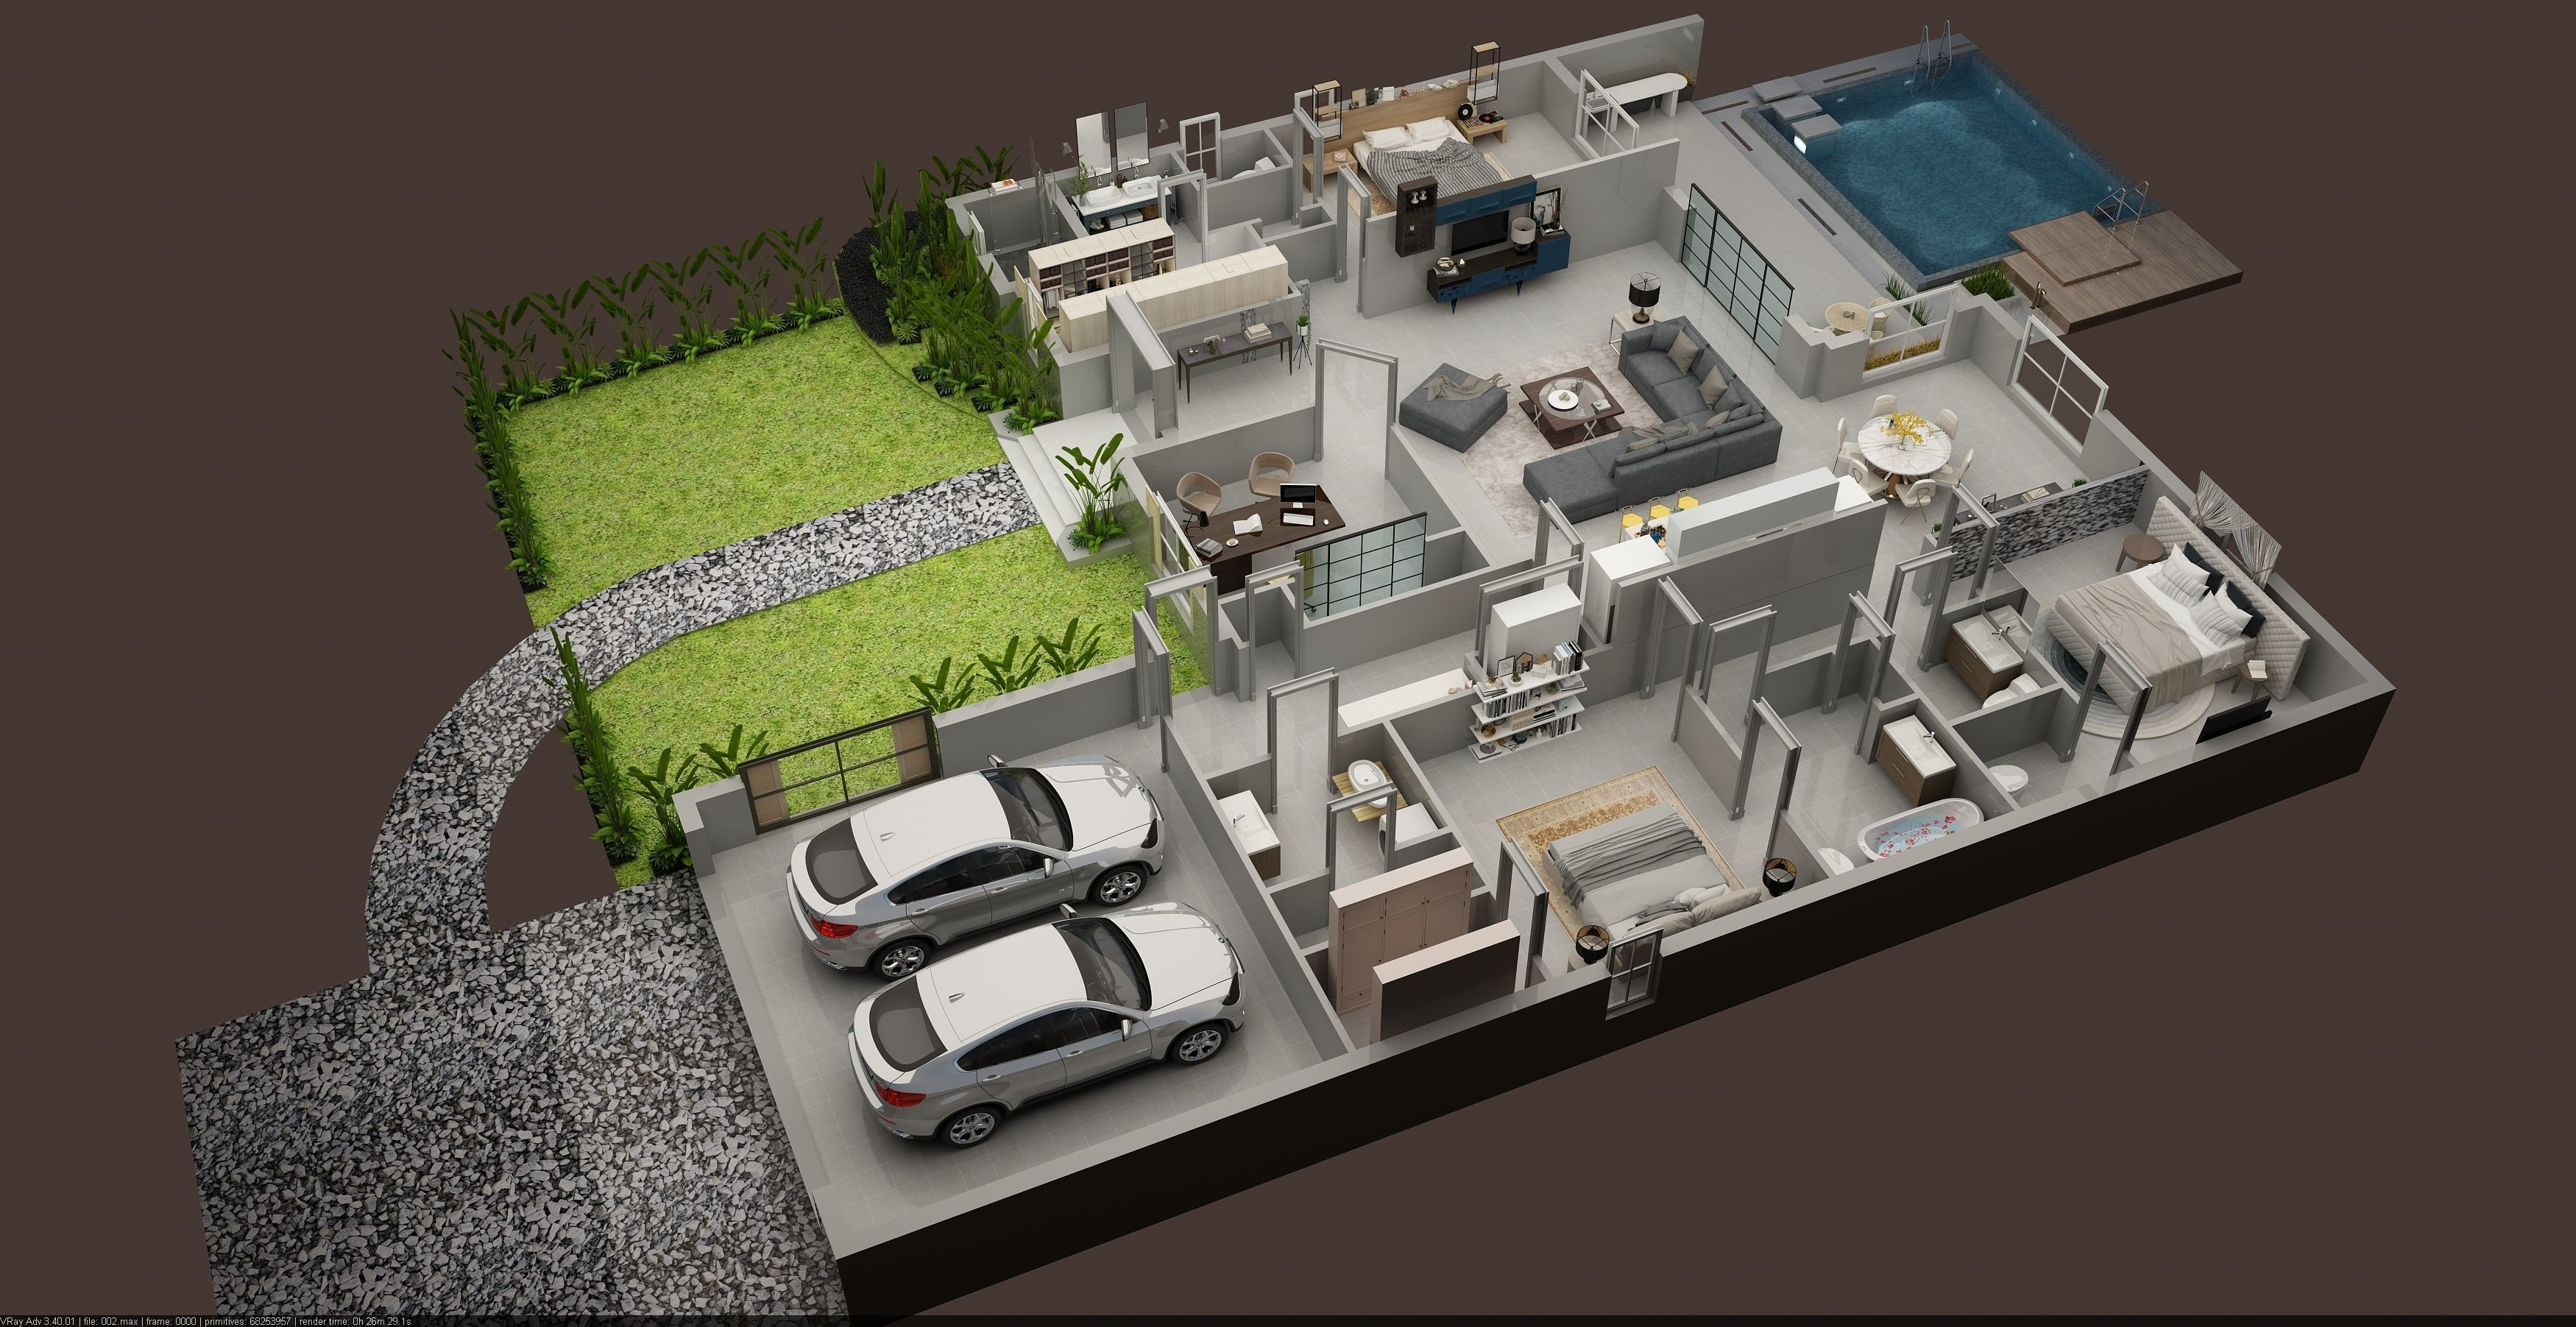 Luxury 3d Floor Plan Of Residential House 3d Model Max Small House Design Plans Model House Plan Home Building Design